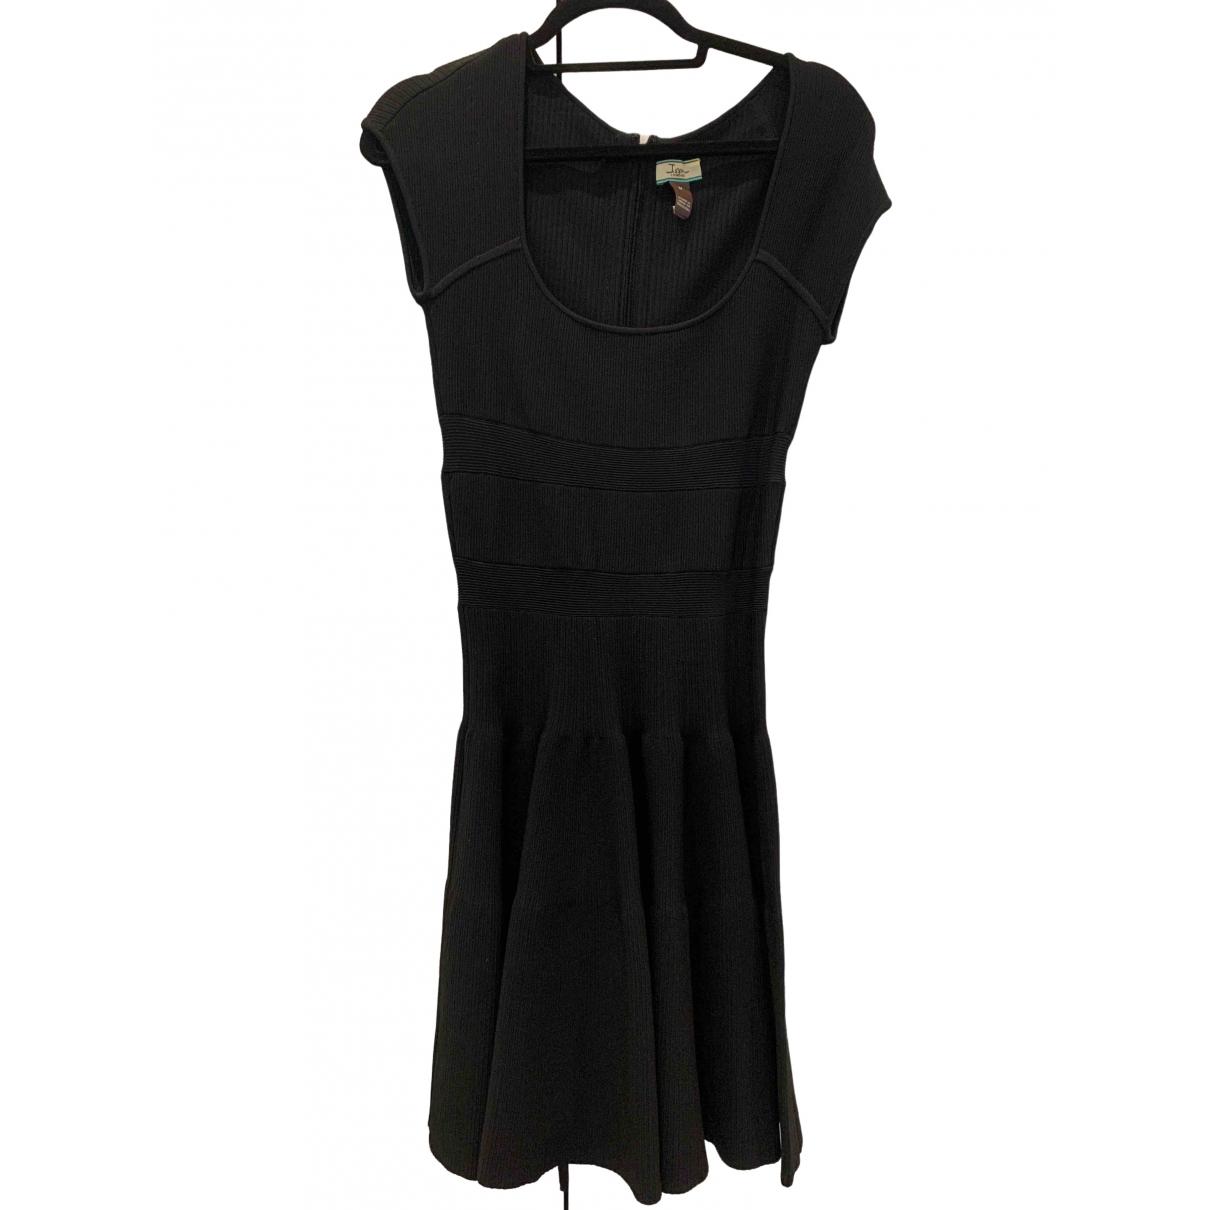 Issa \N Kleid in  Schwarz Baumwolle - Elasthan